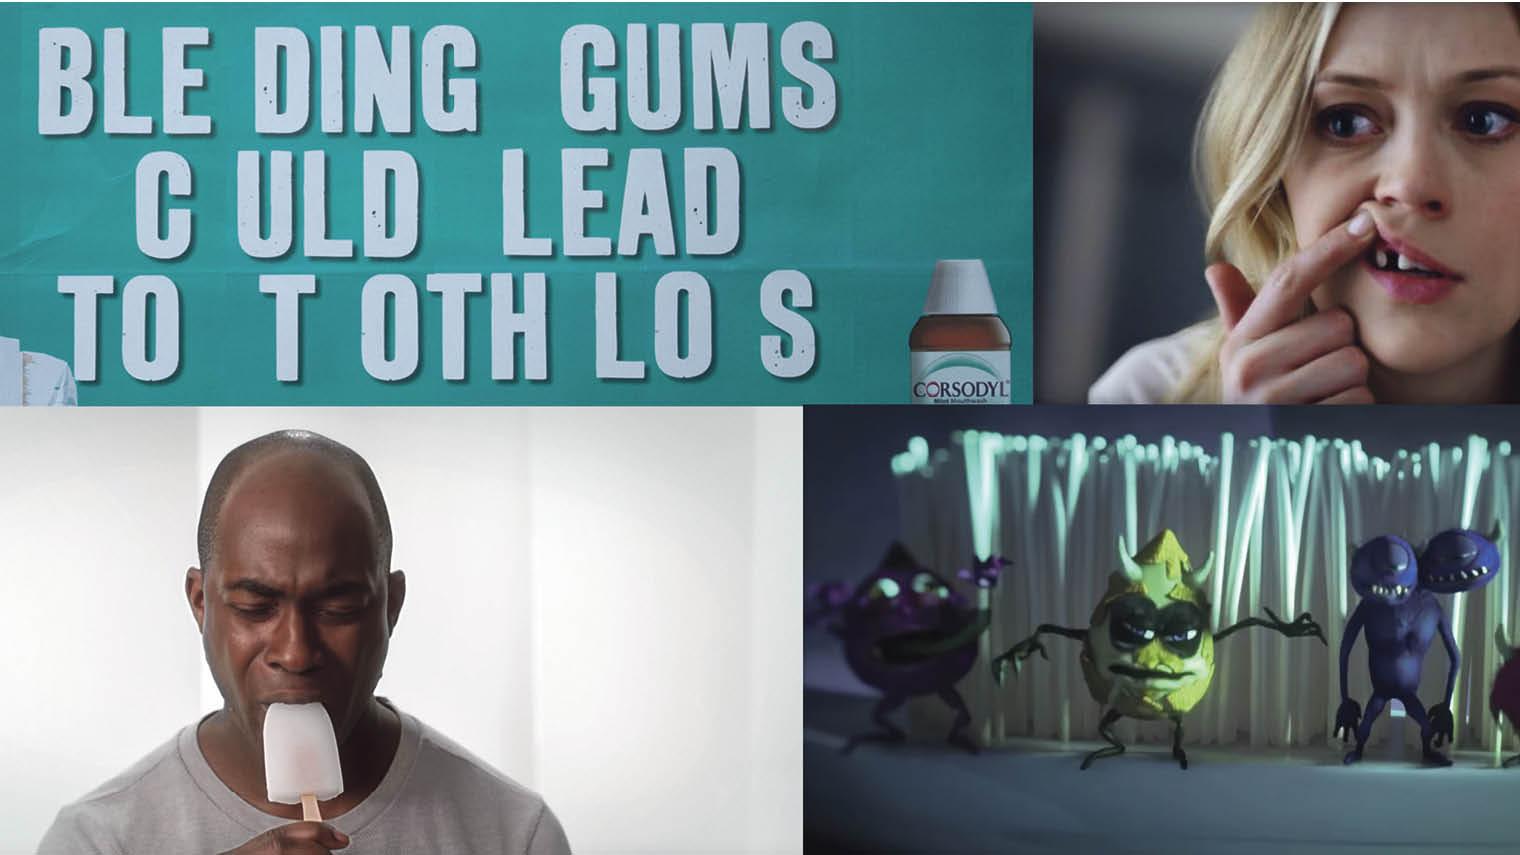 Dental advertising